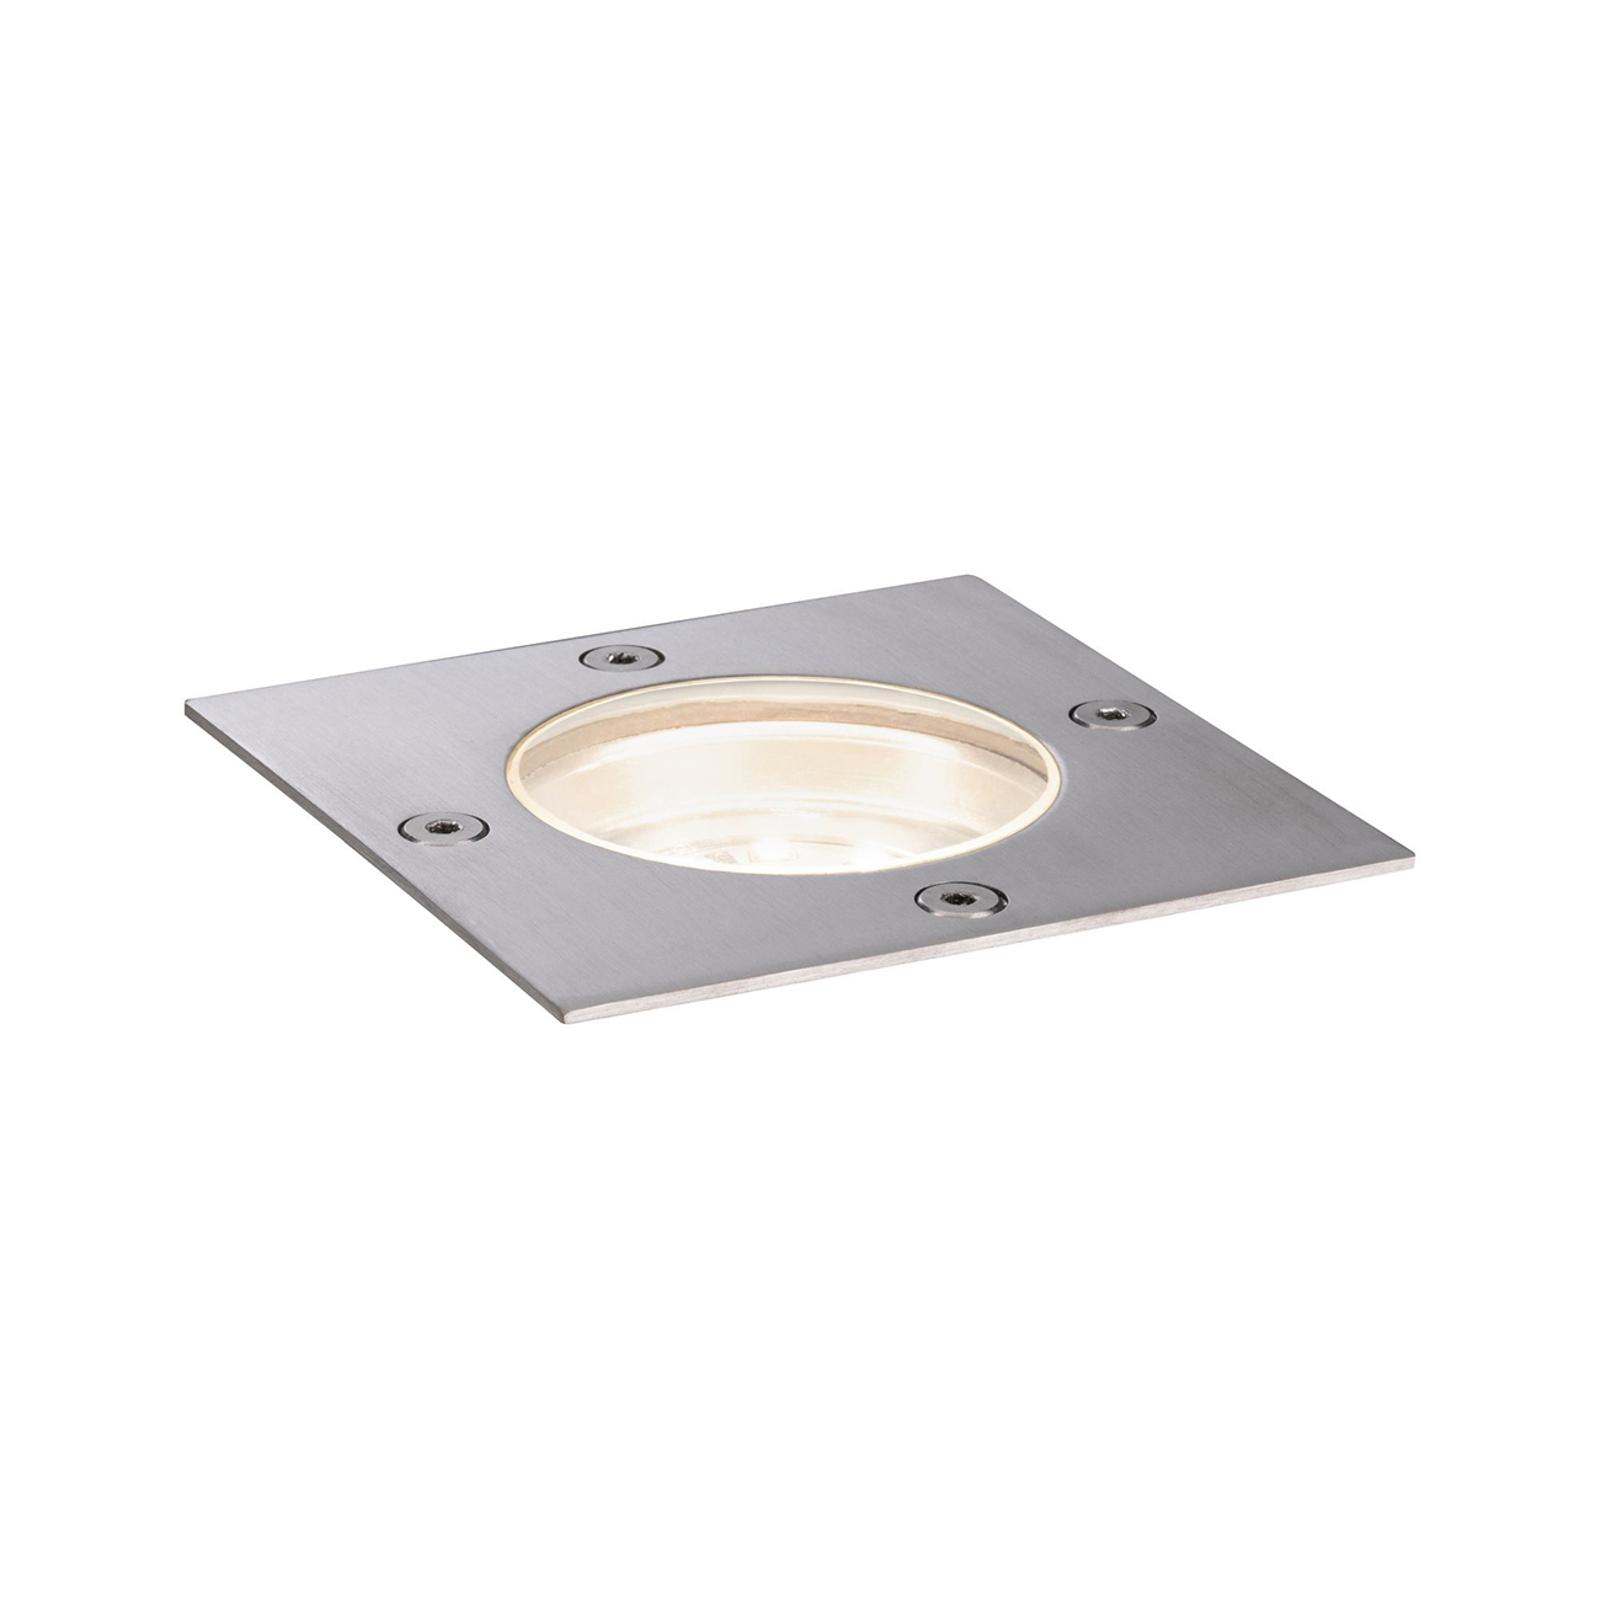 Paulmann Plug & Shine LED-Bodeneinbauleuchte 94227